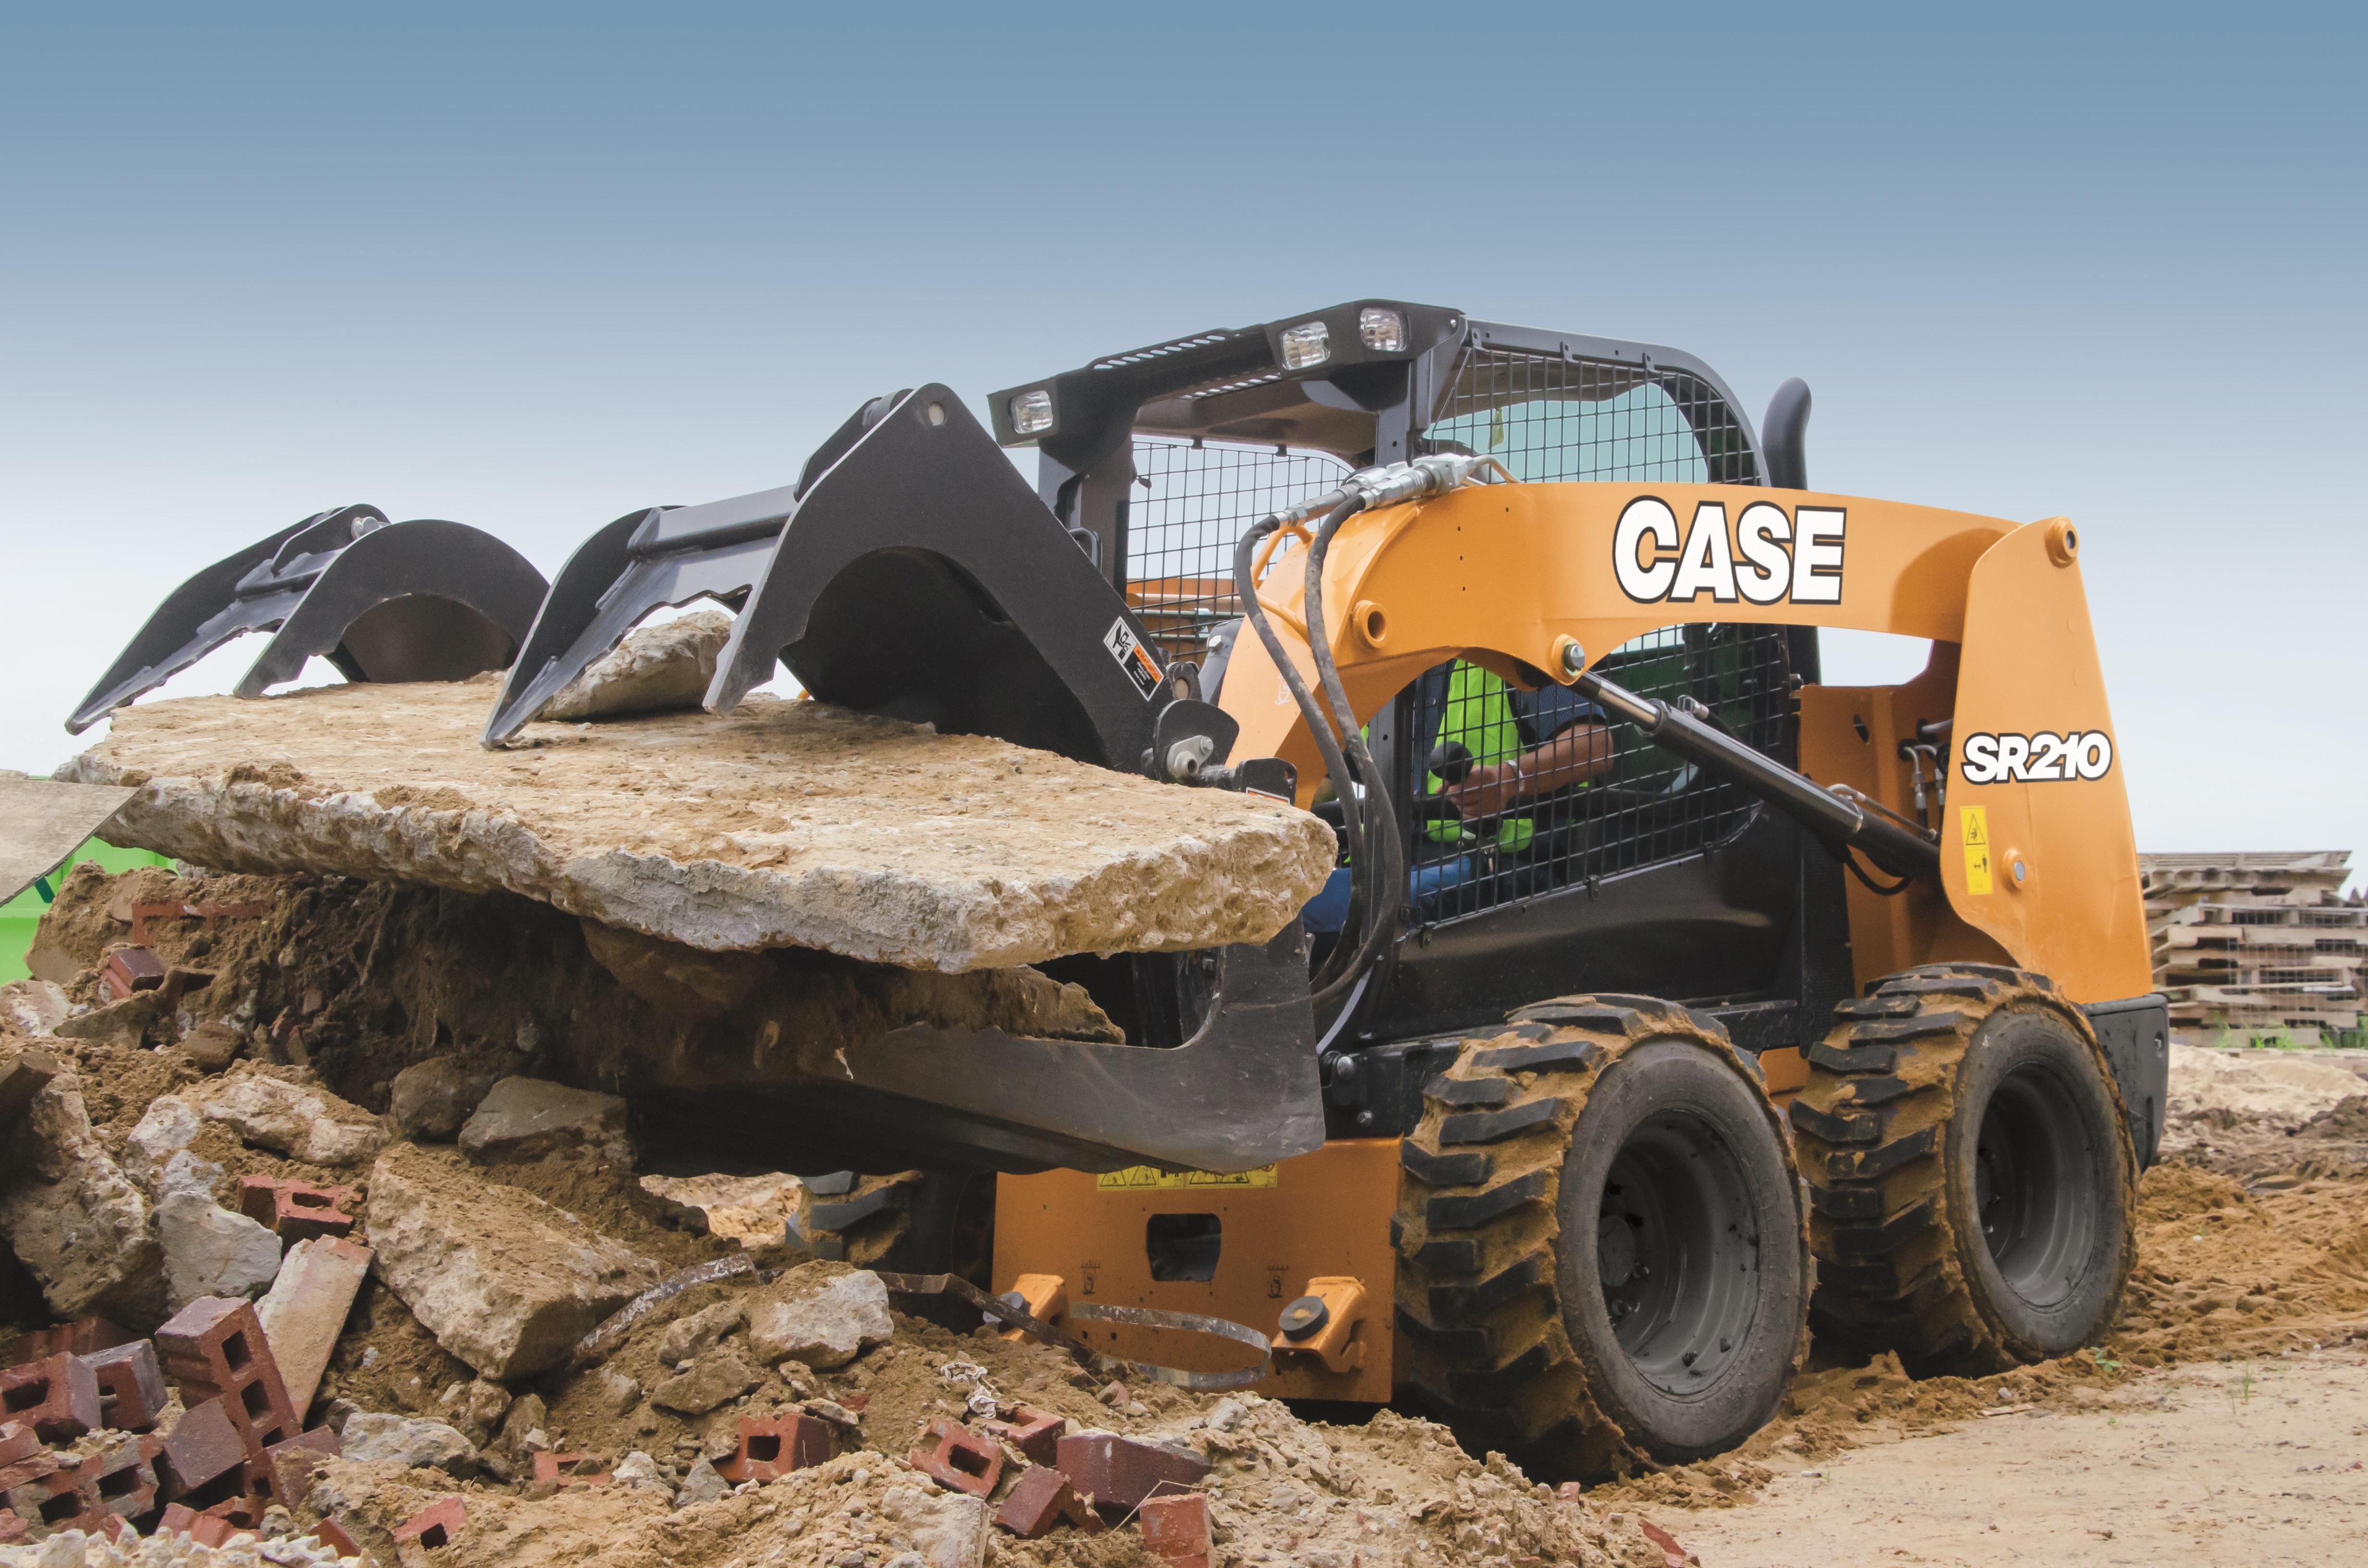 Case Construction Equipment - Wikipedia